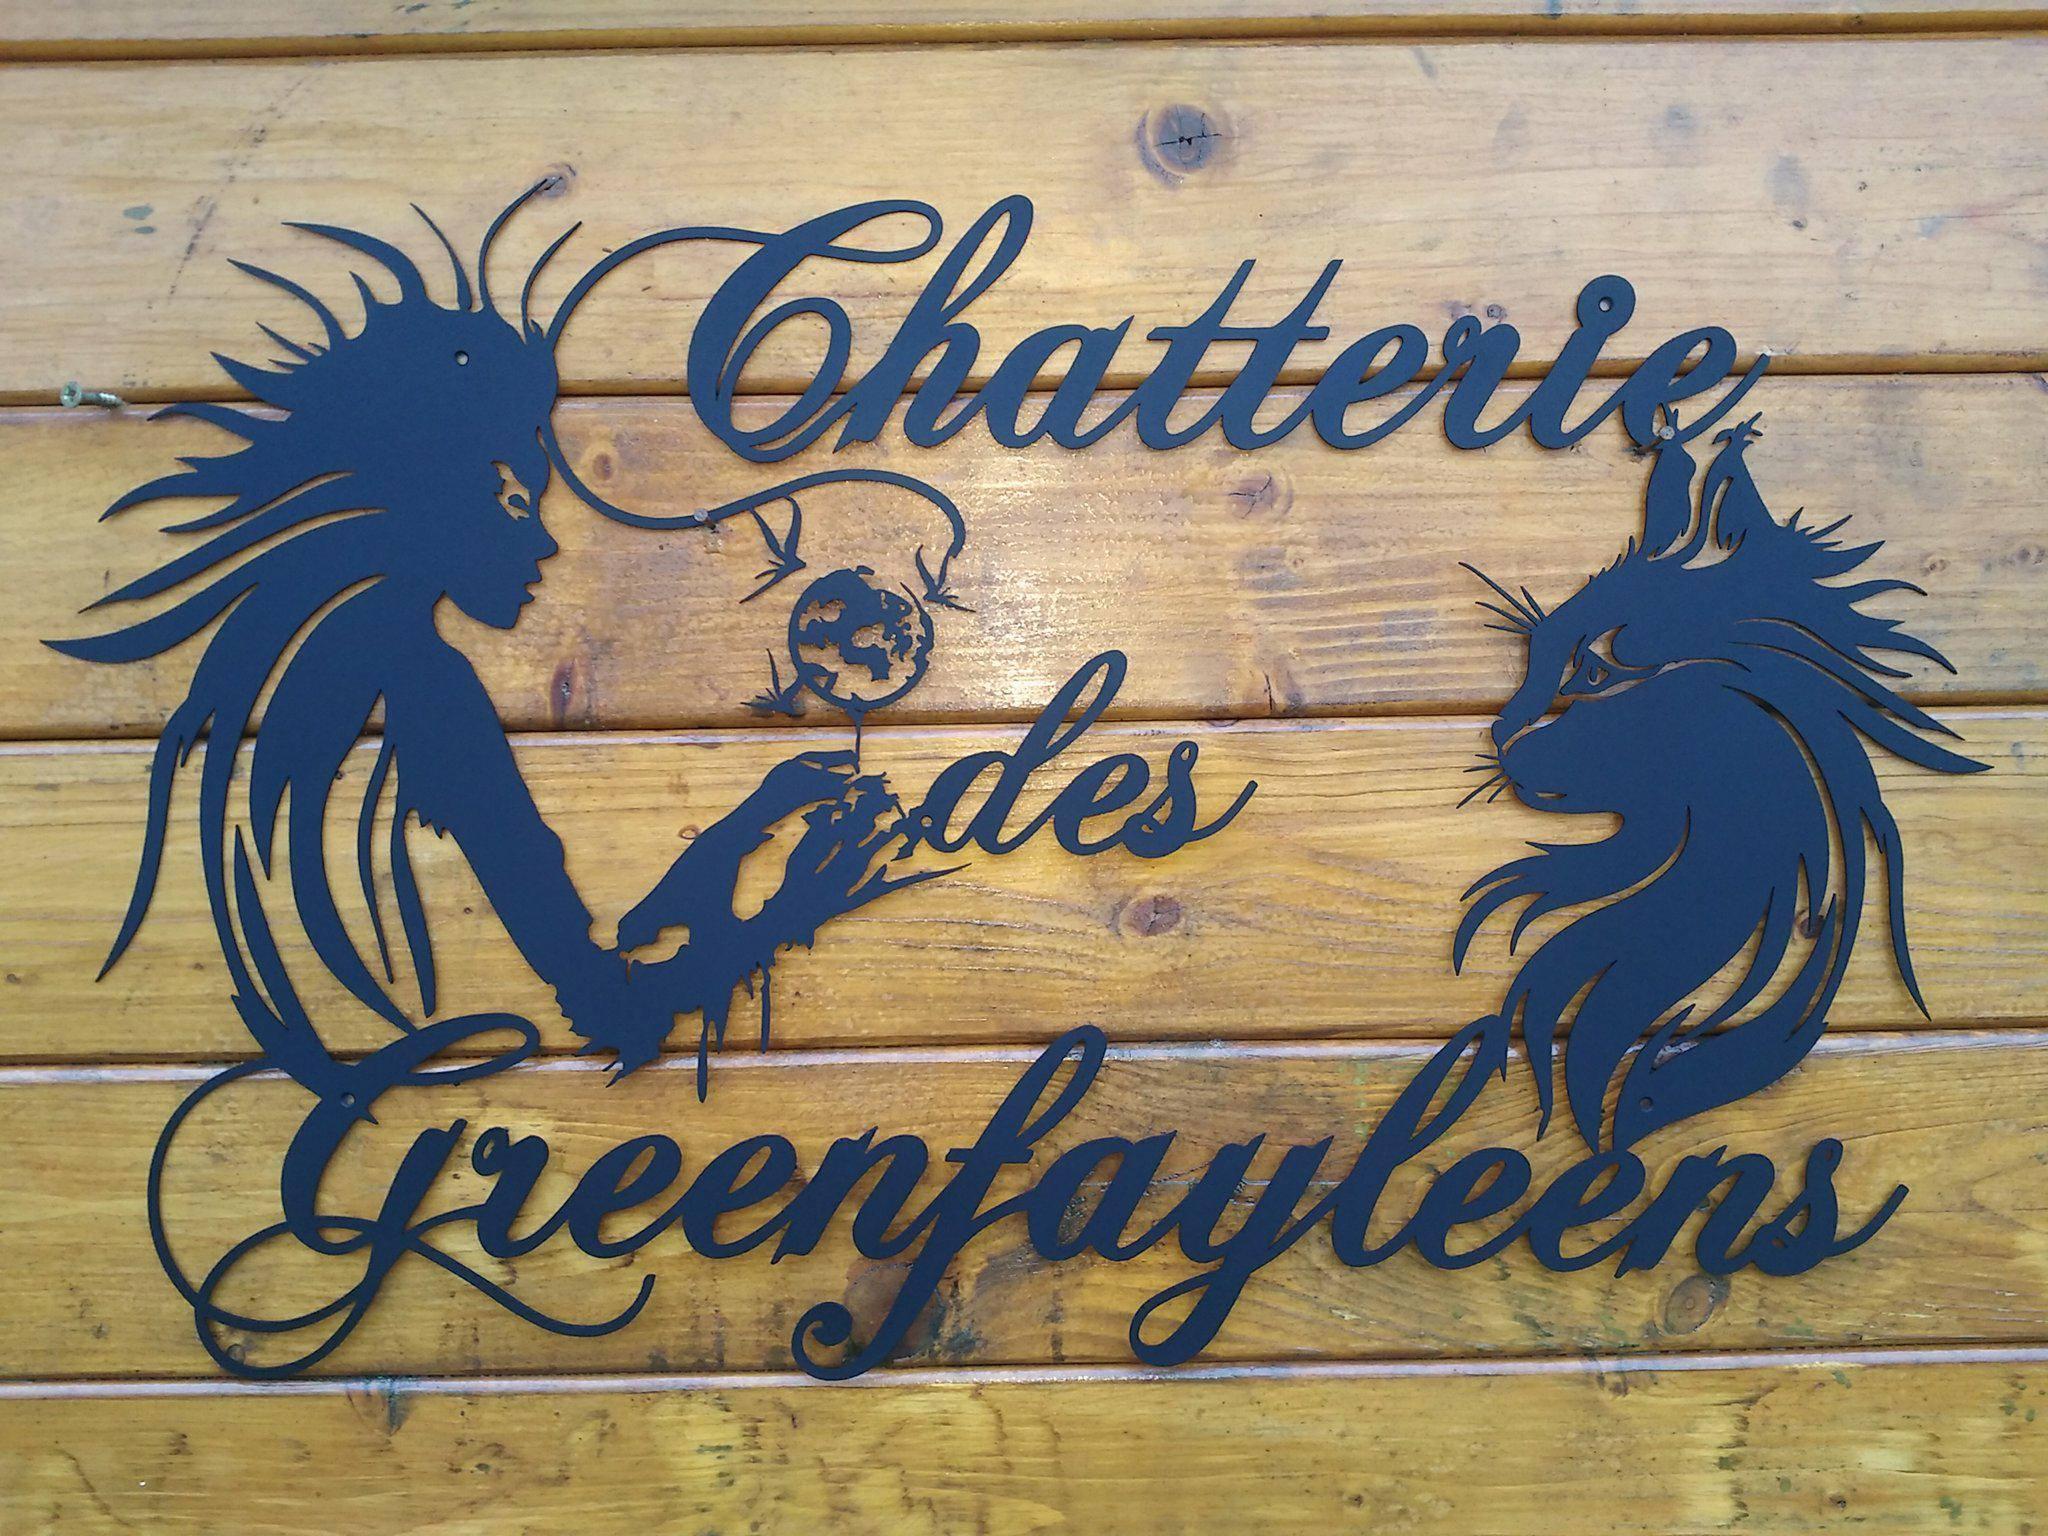 Chatterie des Greenfayleens